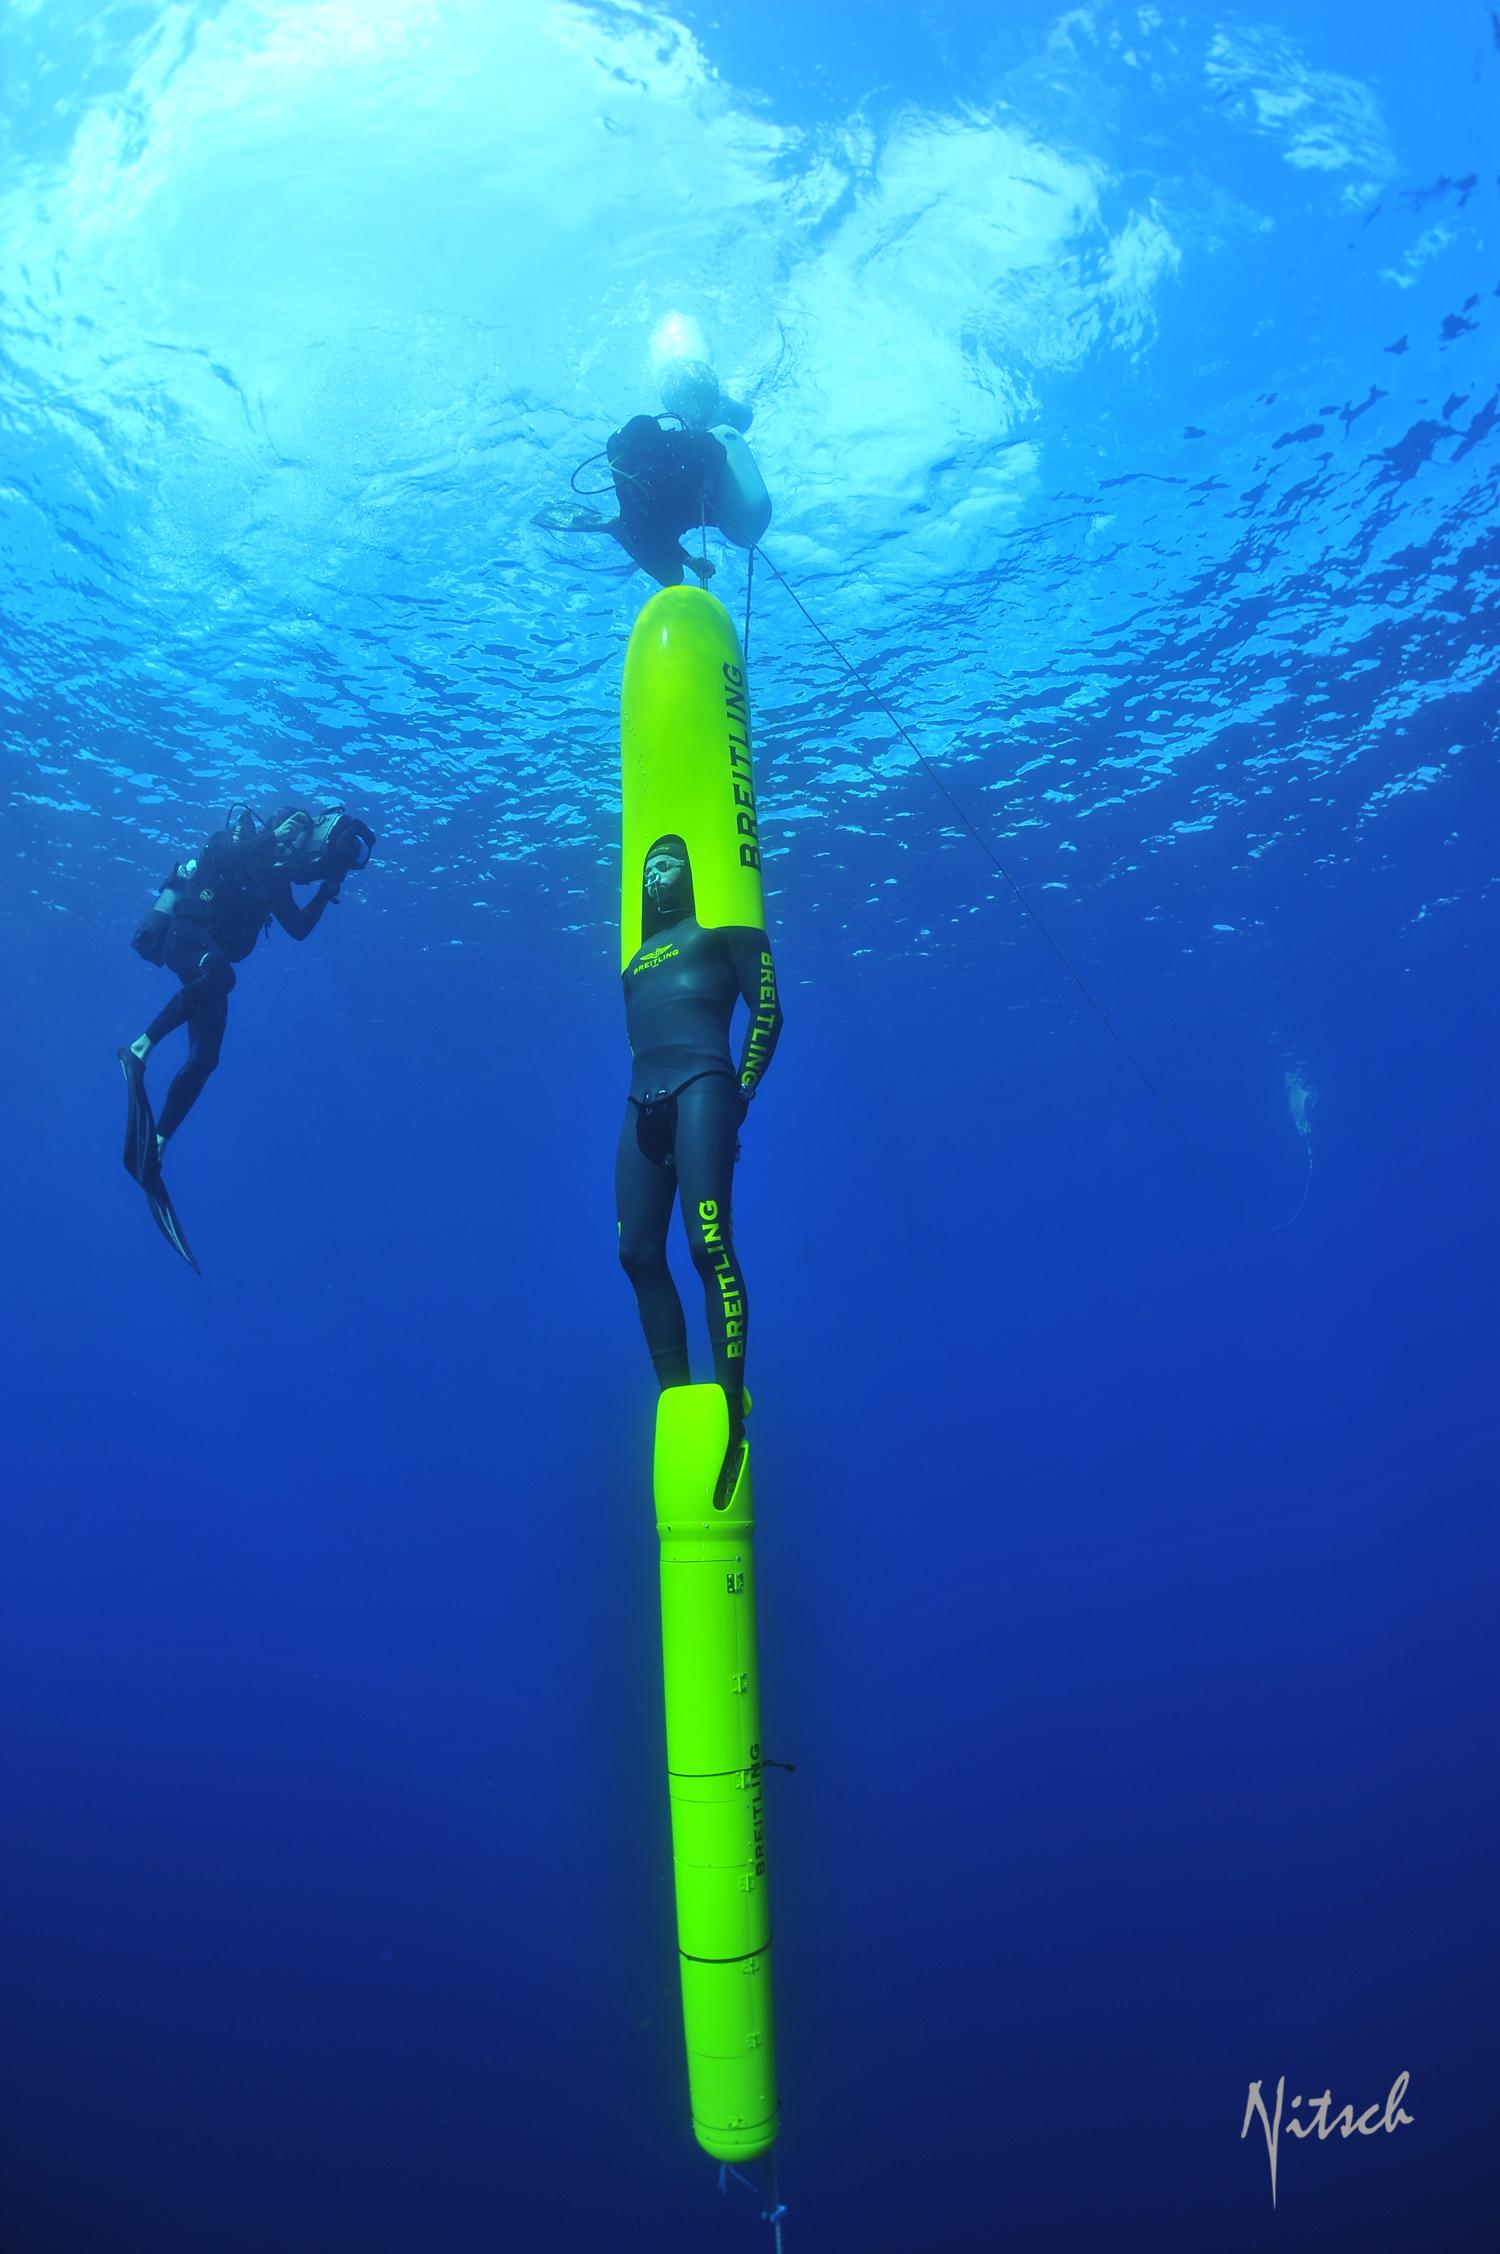 Champion Free Diving: ONE LEG, ONE BREATH: 4X Paralympic Champion Wojtek CZYZ